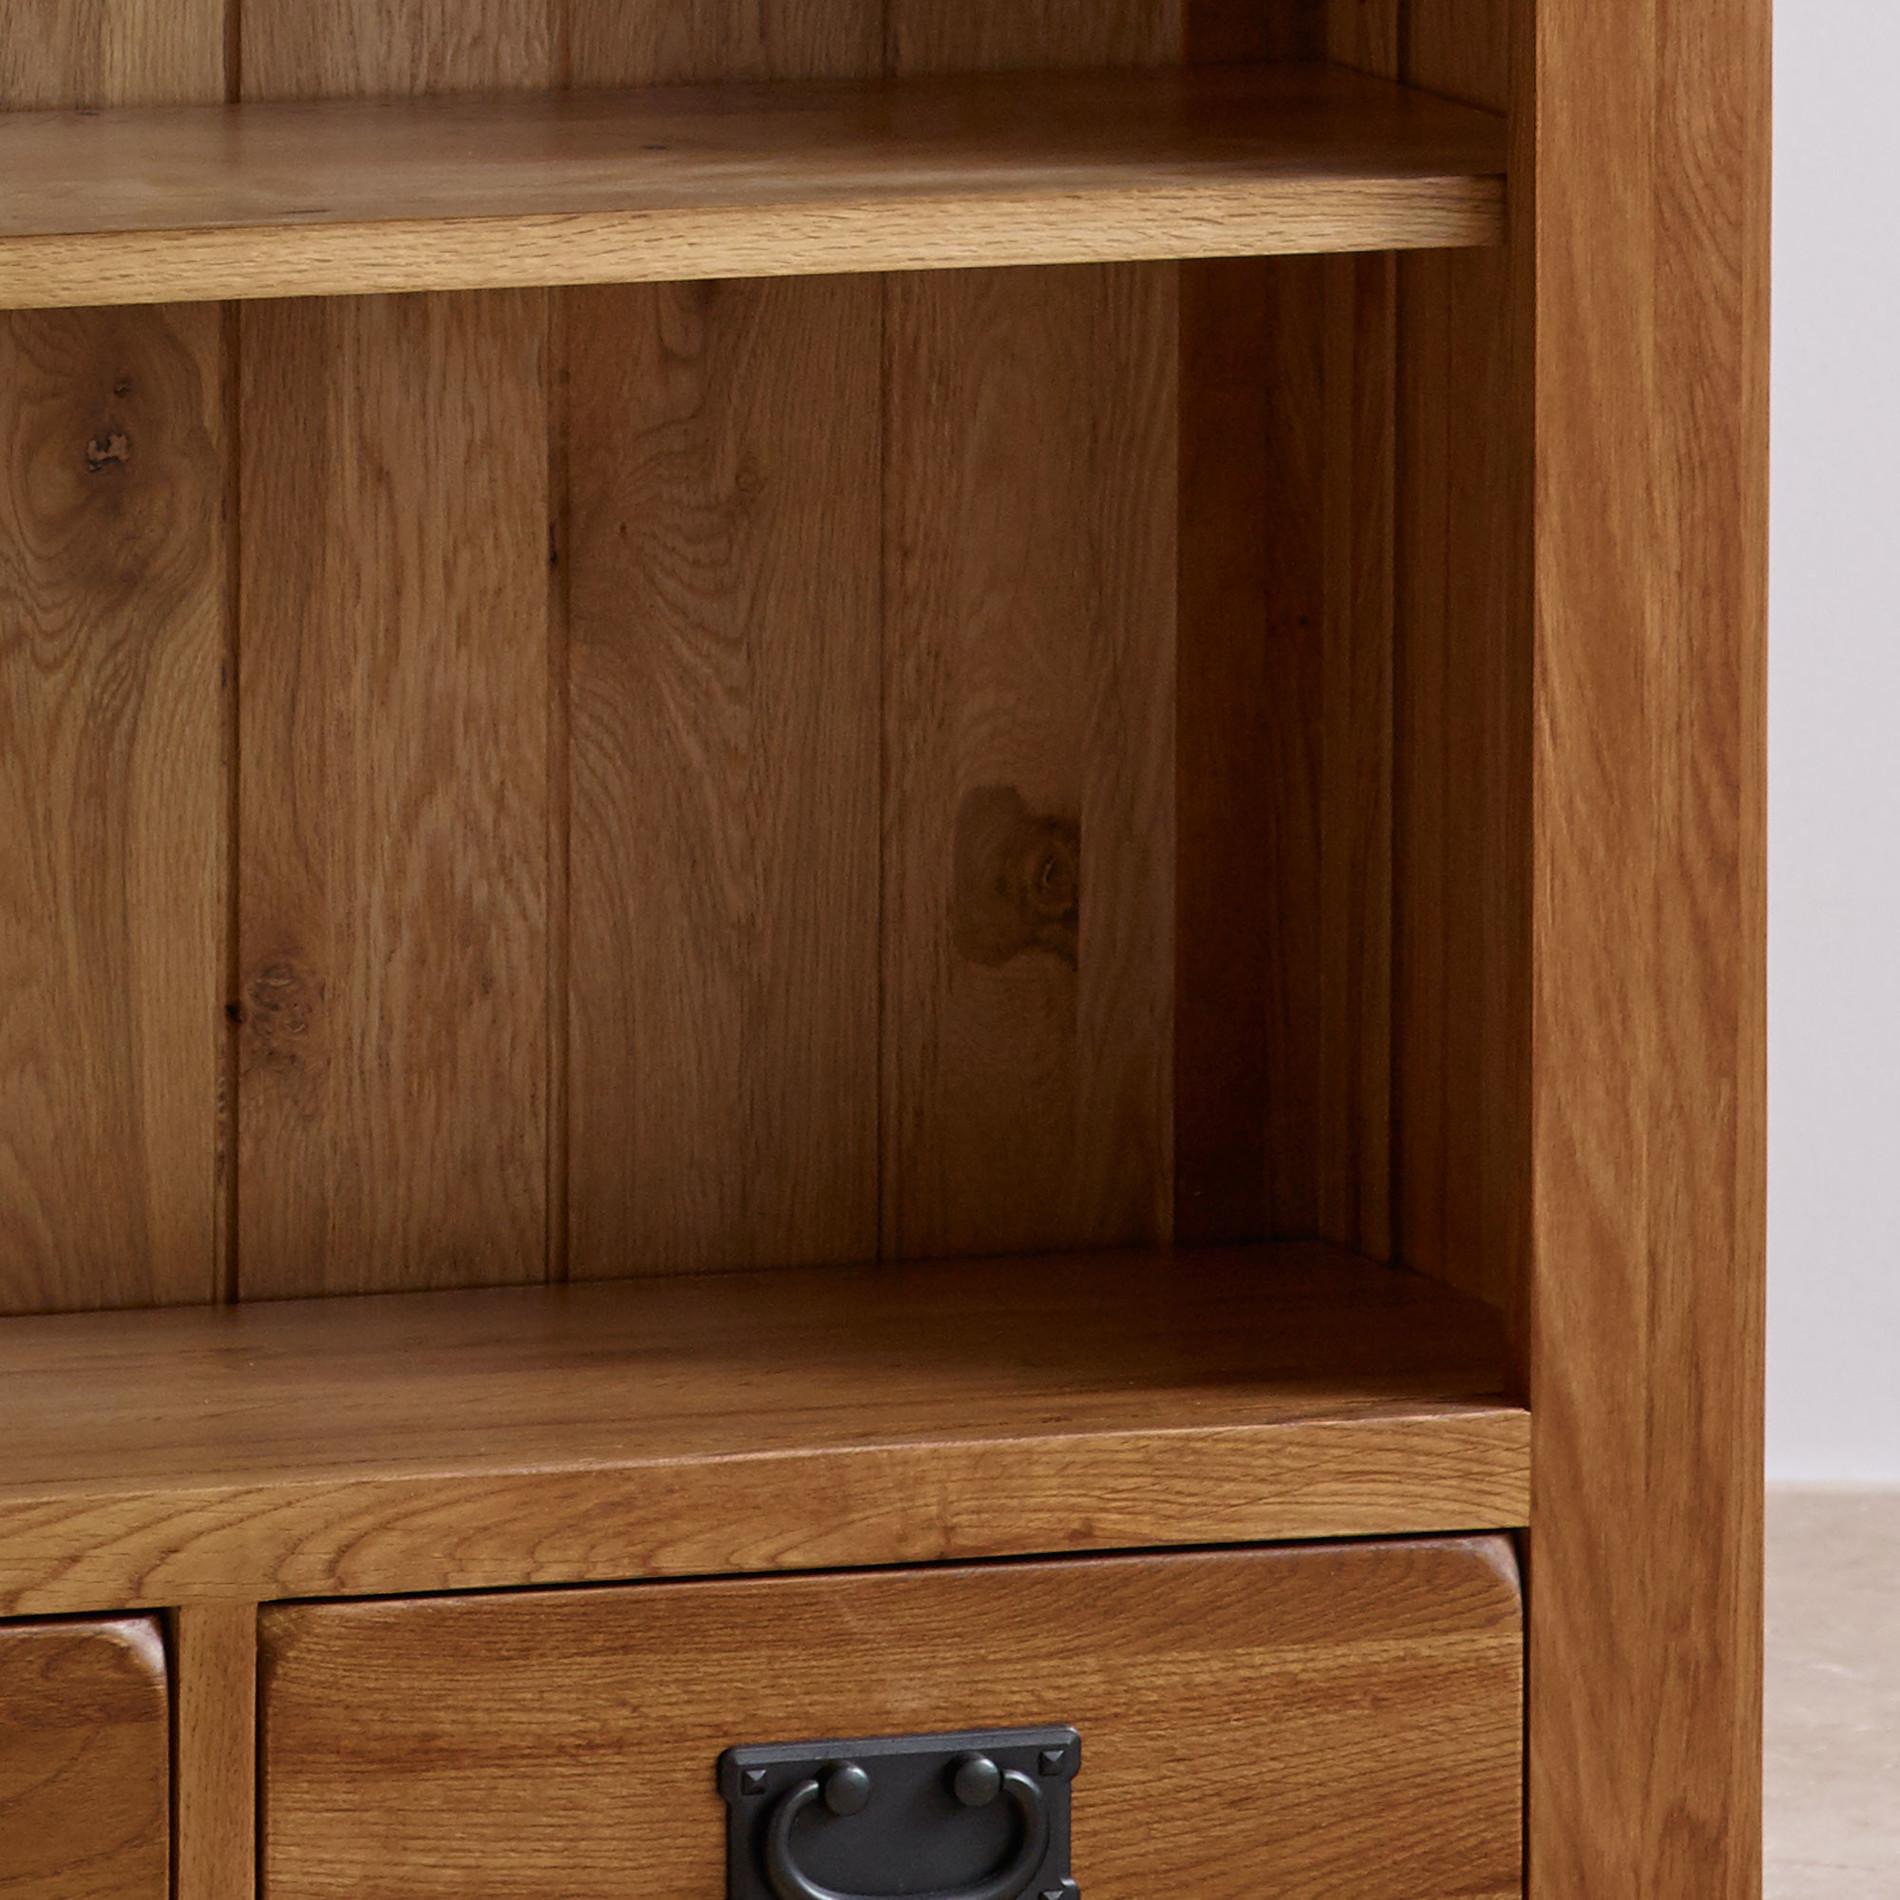 Original Rustic Solid Oak Large Bookcase Home Office